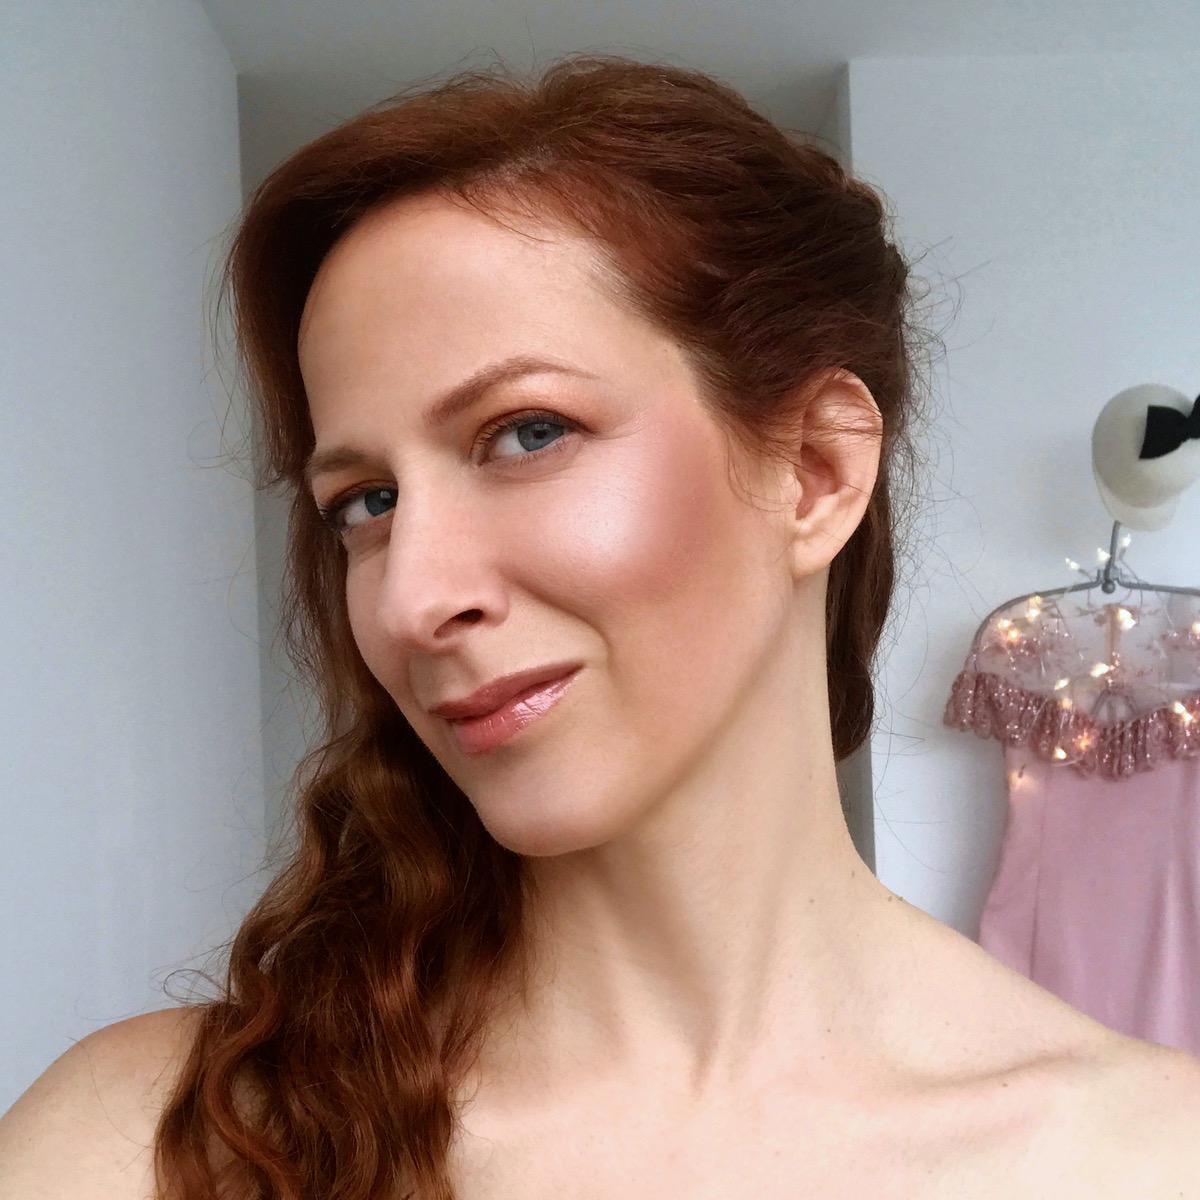 Lotique makeup trenden videz beautyfull blog NIka Veger